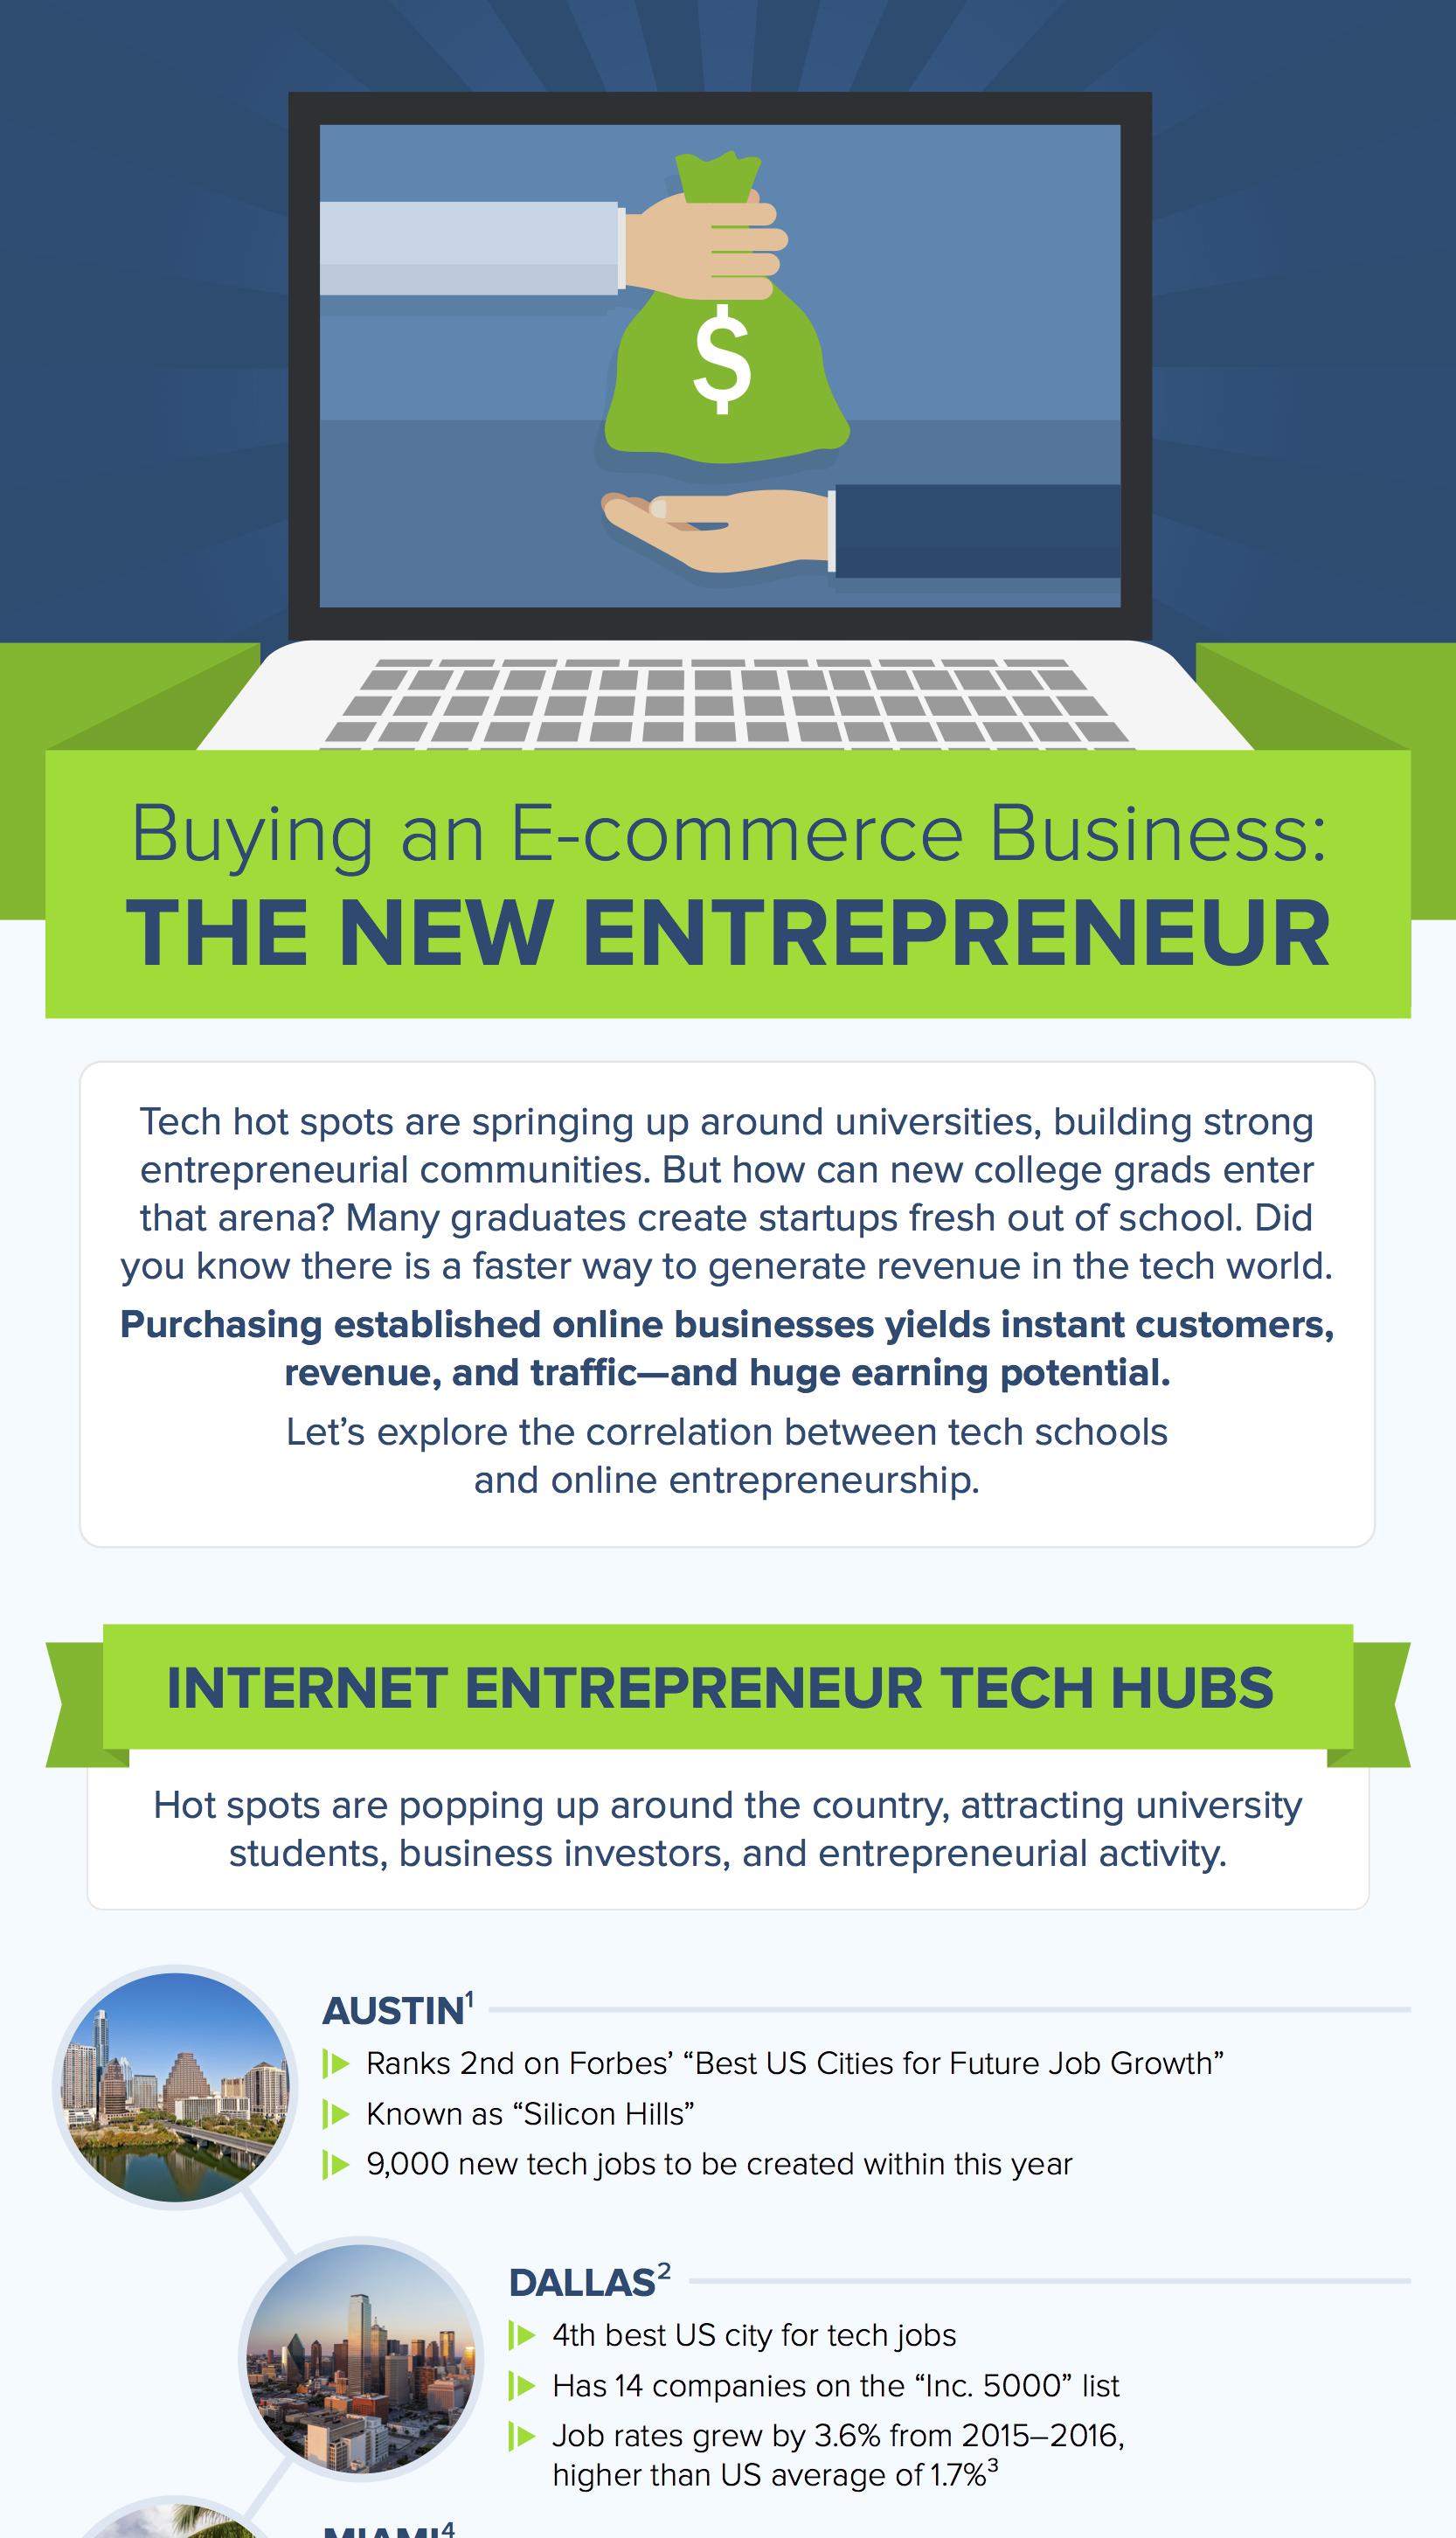 Buy Online Business: Entrepreneurship Through Acquisition   Quiet Light  Brokerage